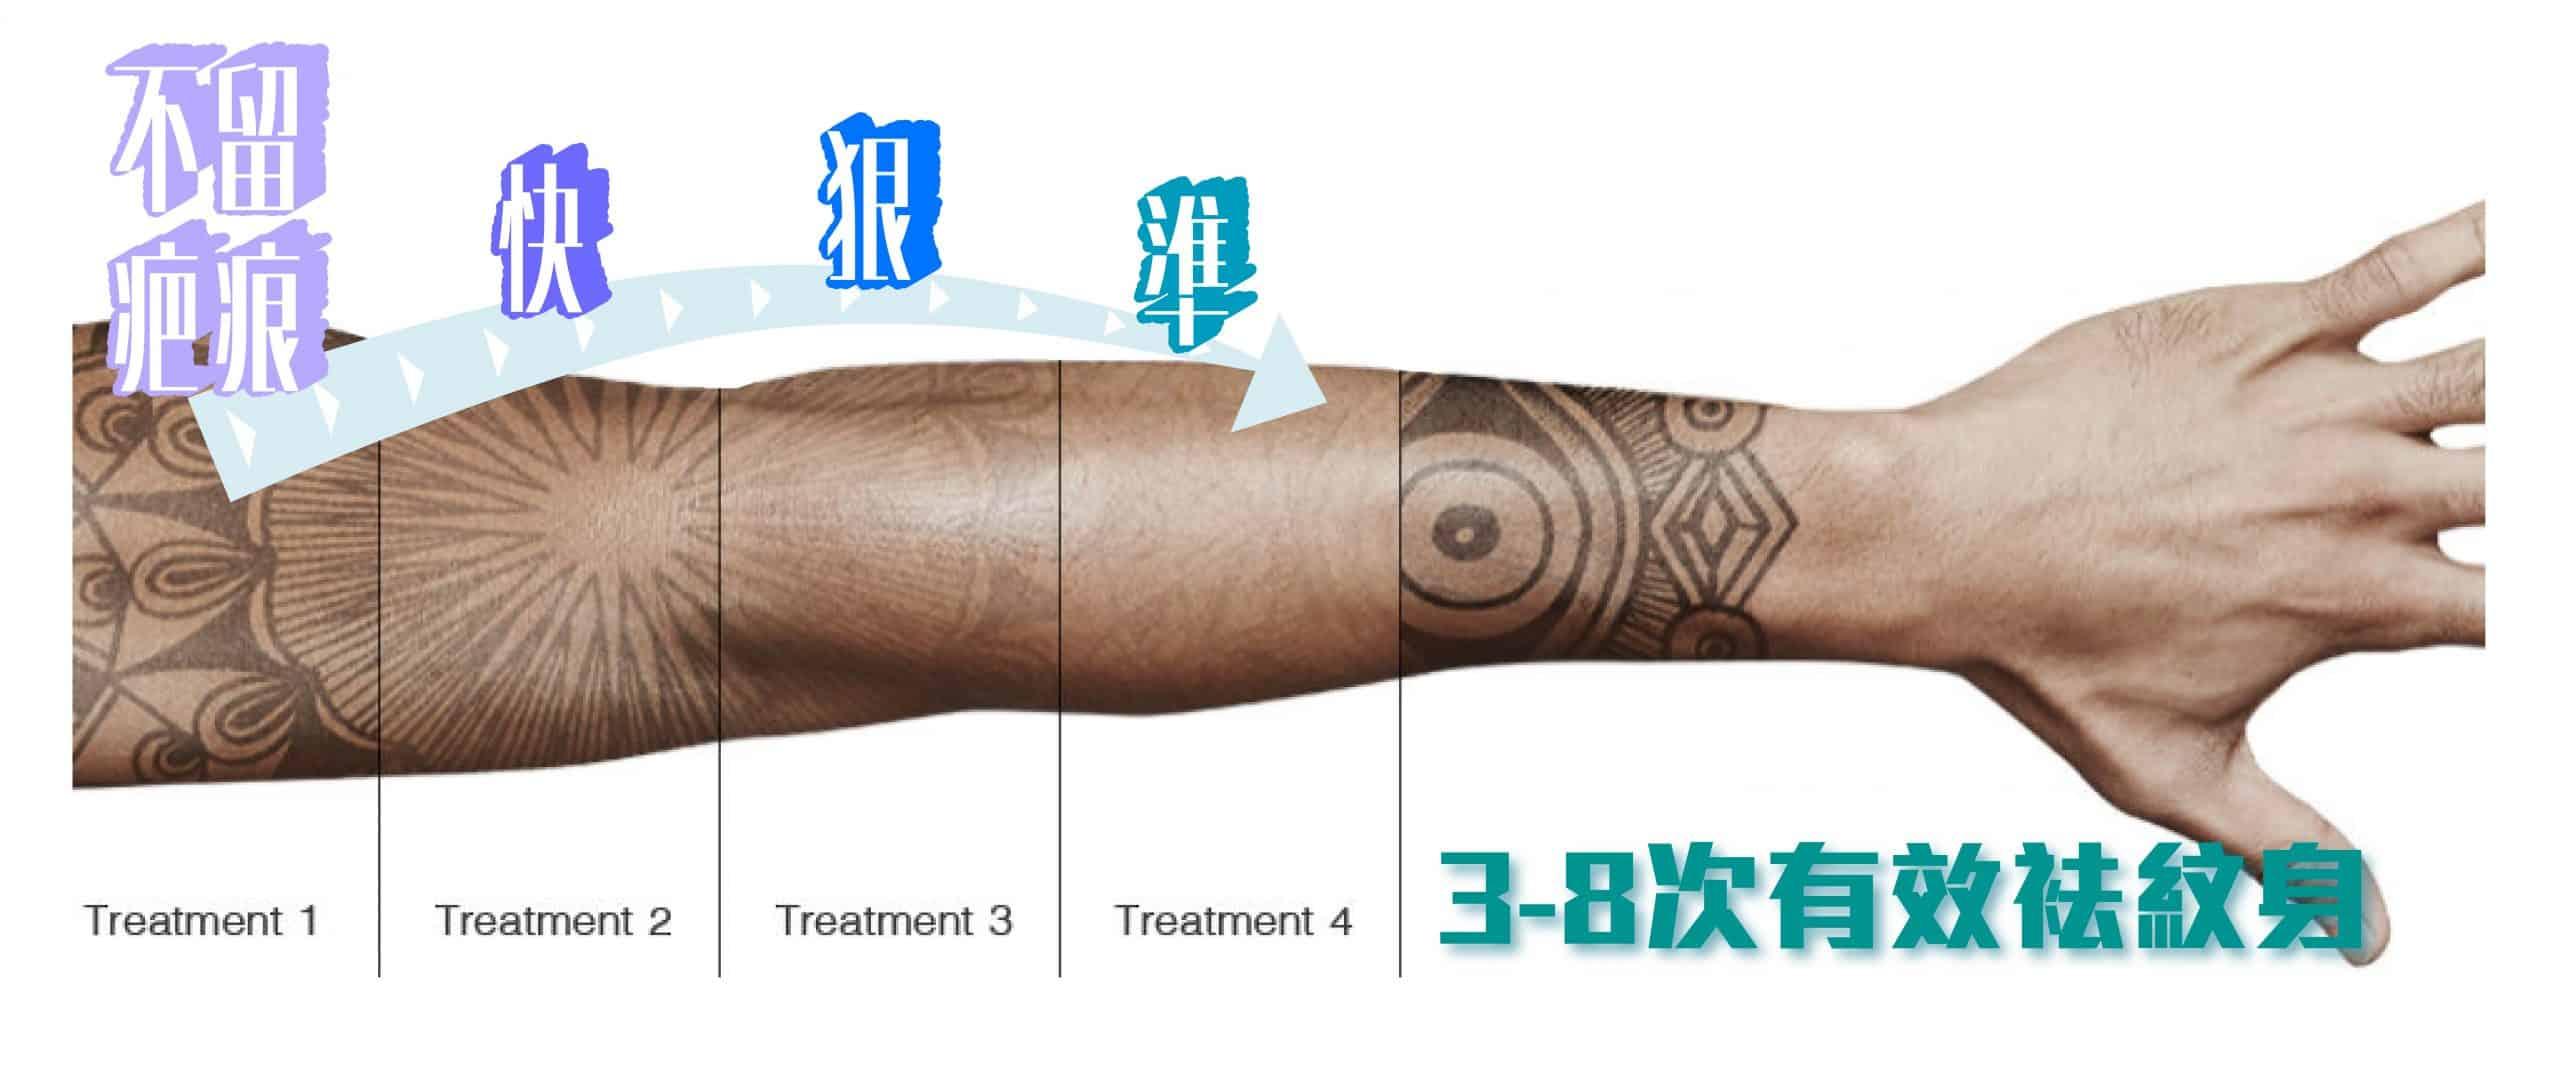 Picoway_tattoo Pico tattoo m 41 scaled